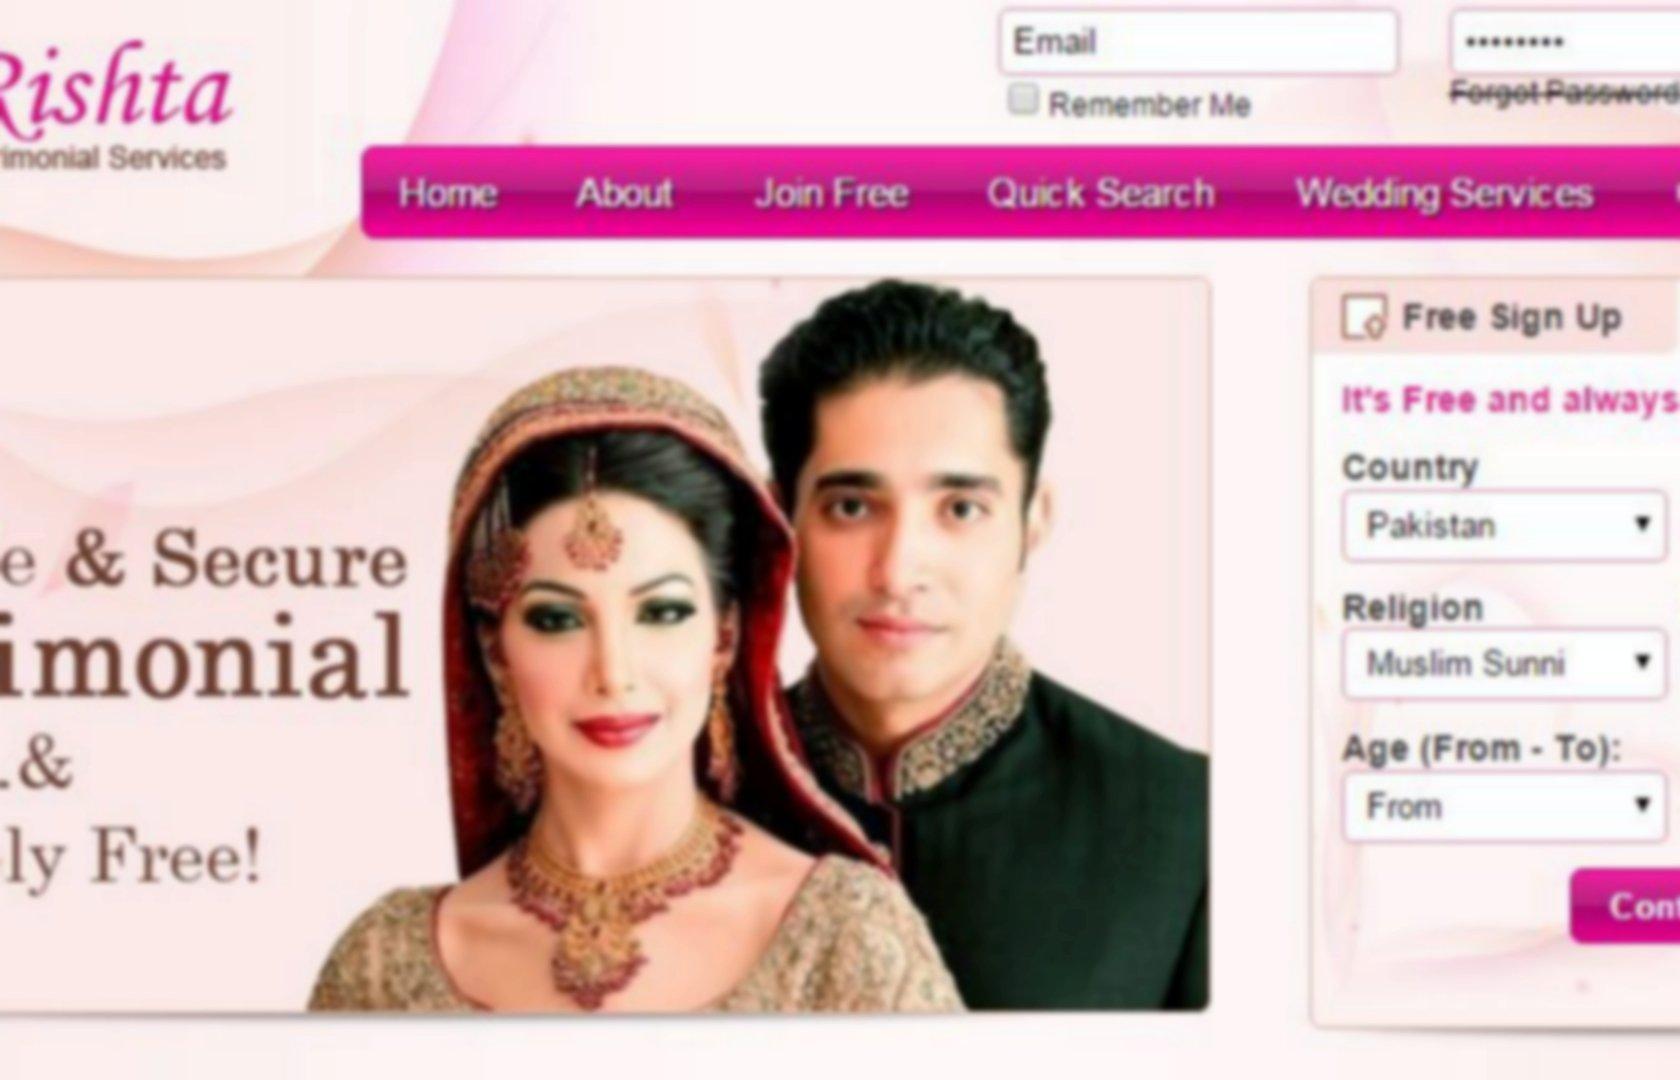 Get Rishata Matrimony (marriagebureau)   Pearltrees